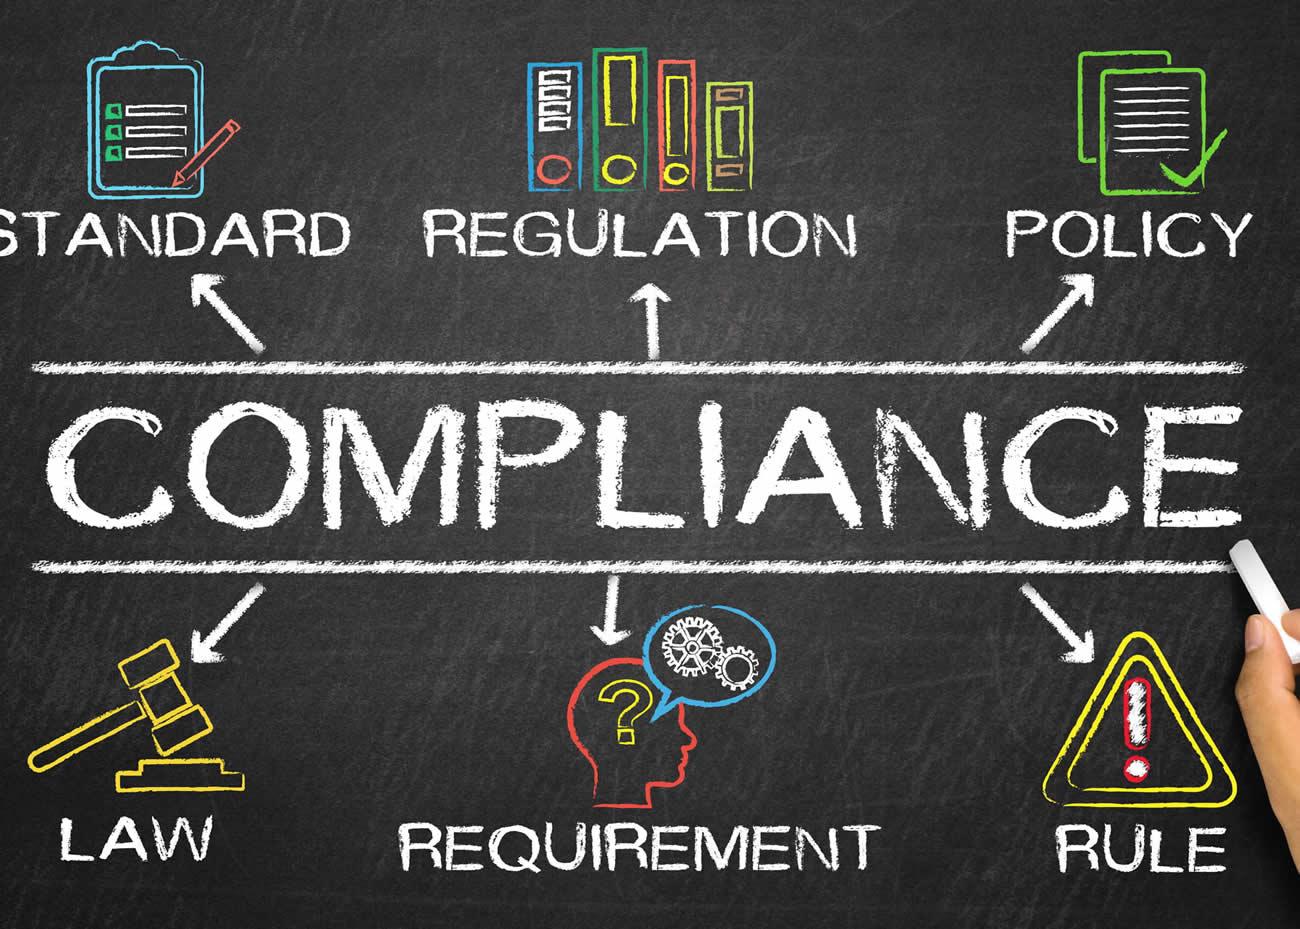 naem-2018-blog-compliance-concept-diagram-related-keywords-elements-700x500